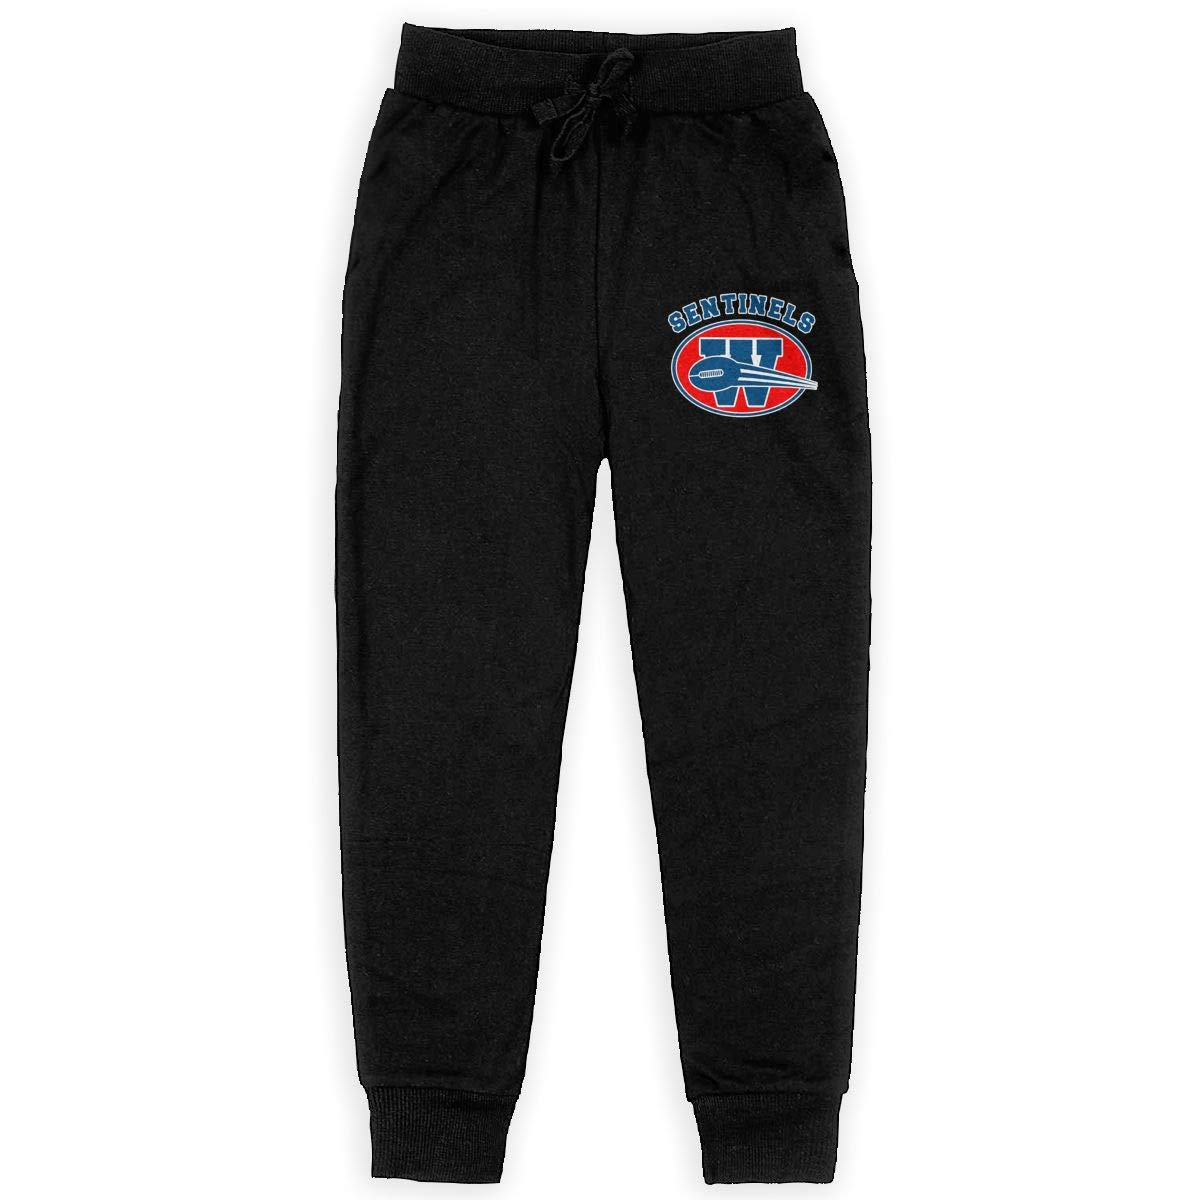 Kim Mittelstaedt Football Team Boys Big Active Basic Casual Pants Sweatpants for Boys Black